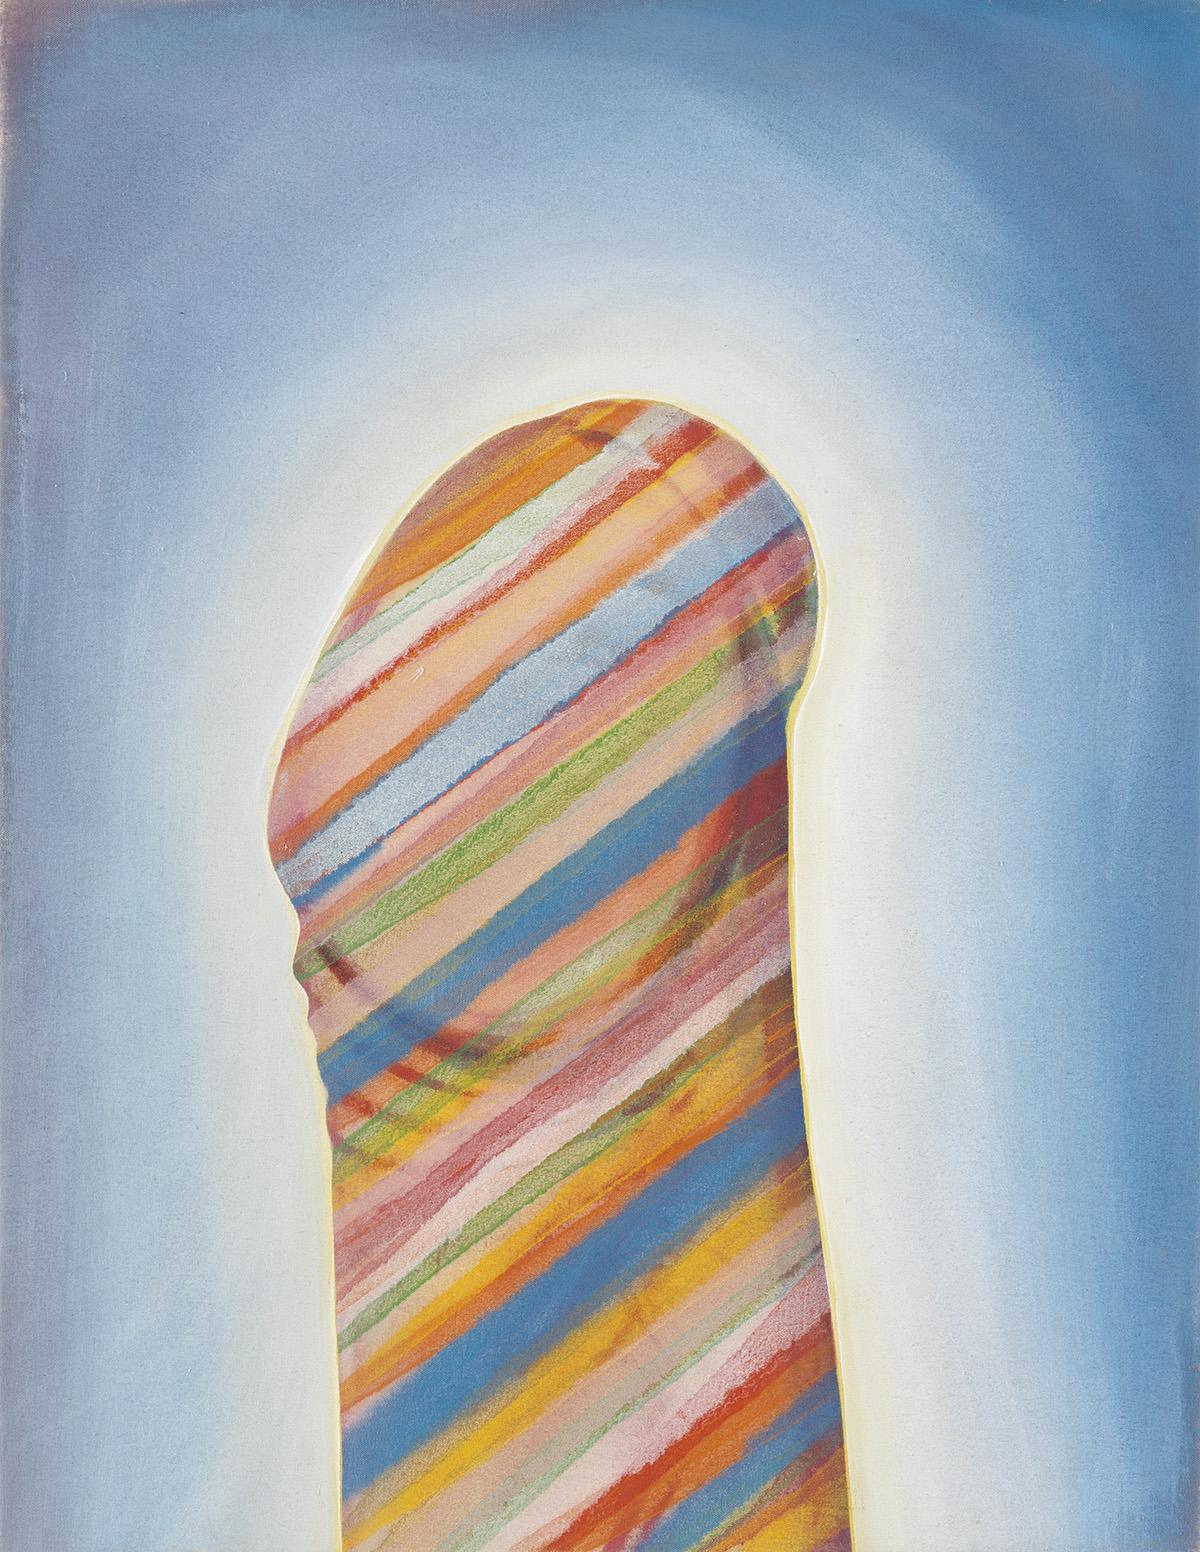 ROBERT ARNESON (1930-1992)  Striped Penis.